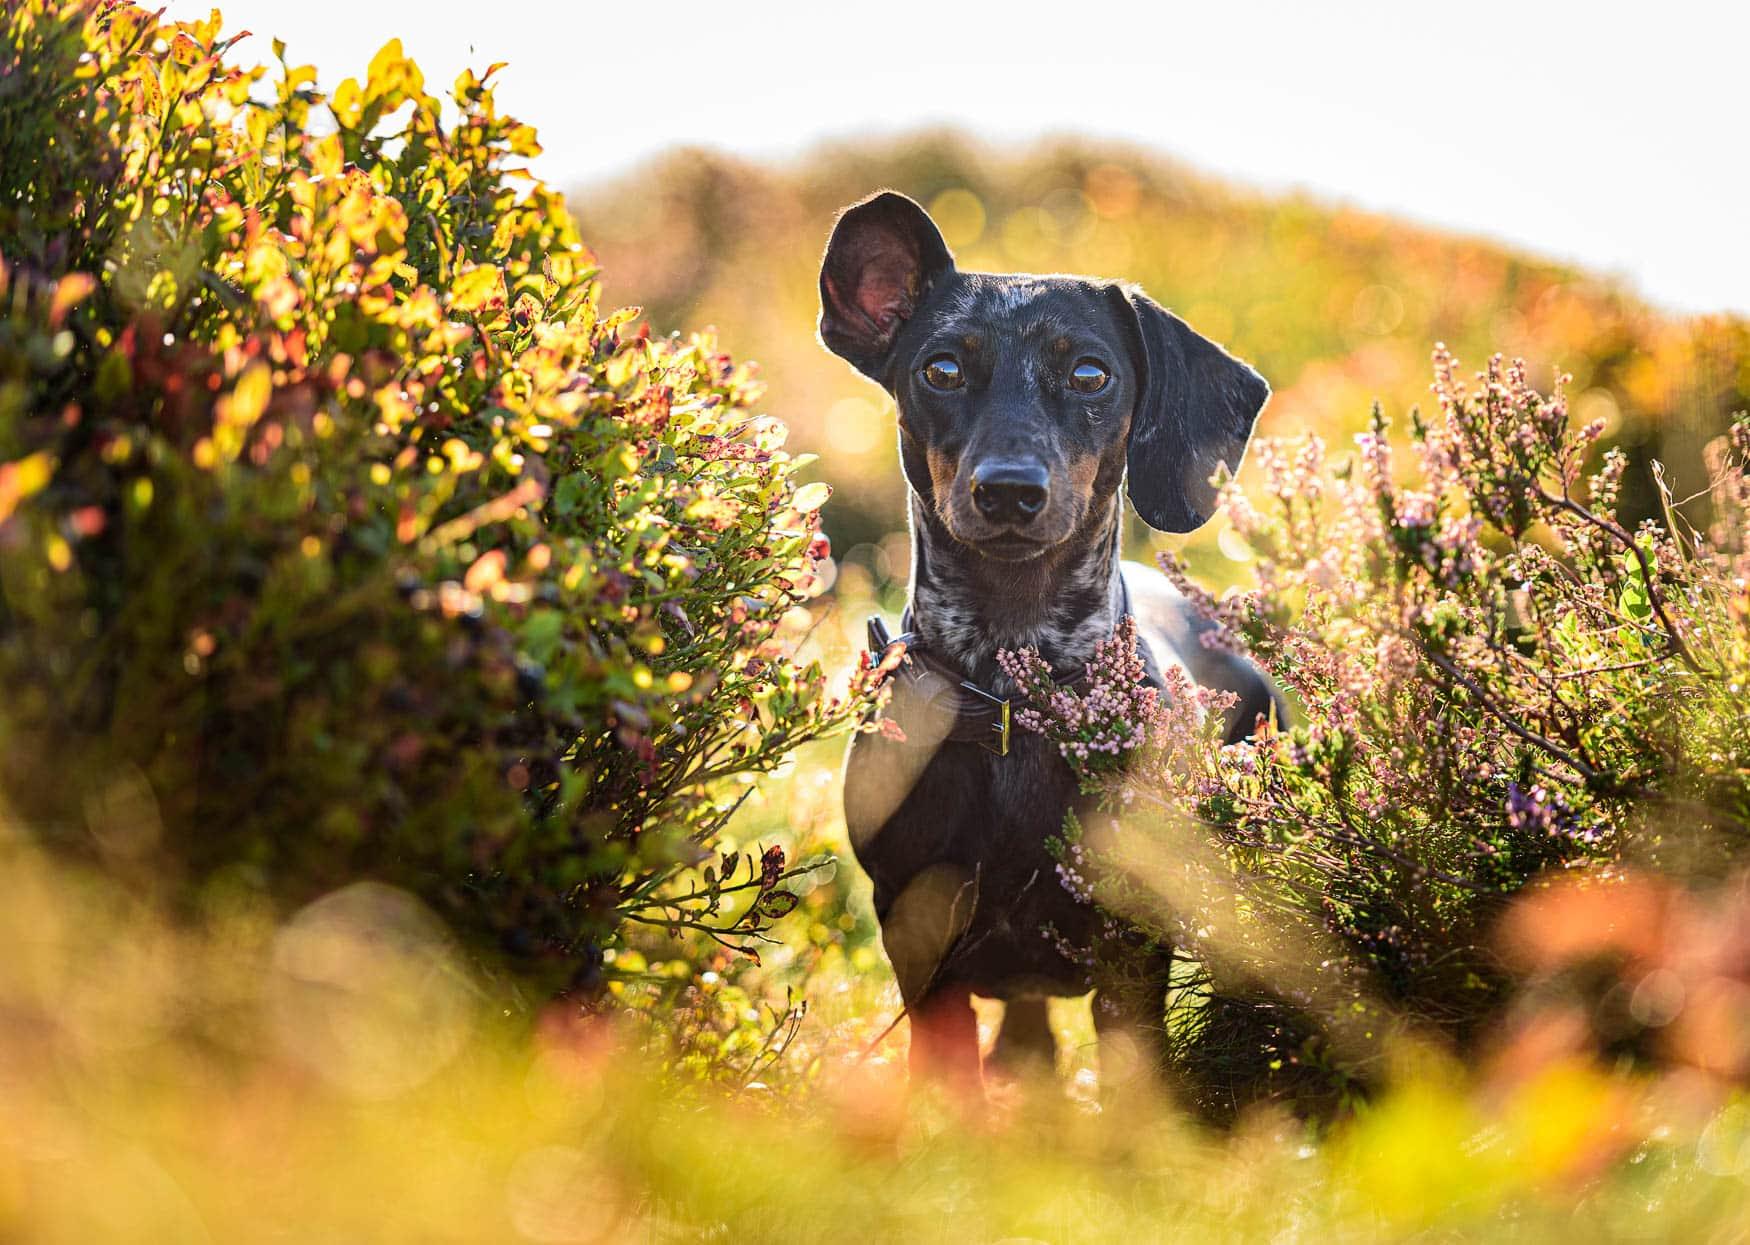 Wirral Dog Photographer - Silver Dapple Miniature Short-haired Dachshund